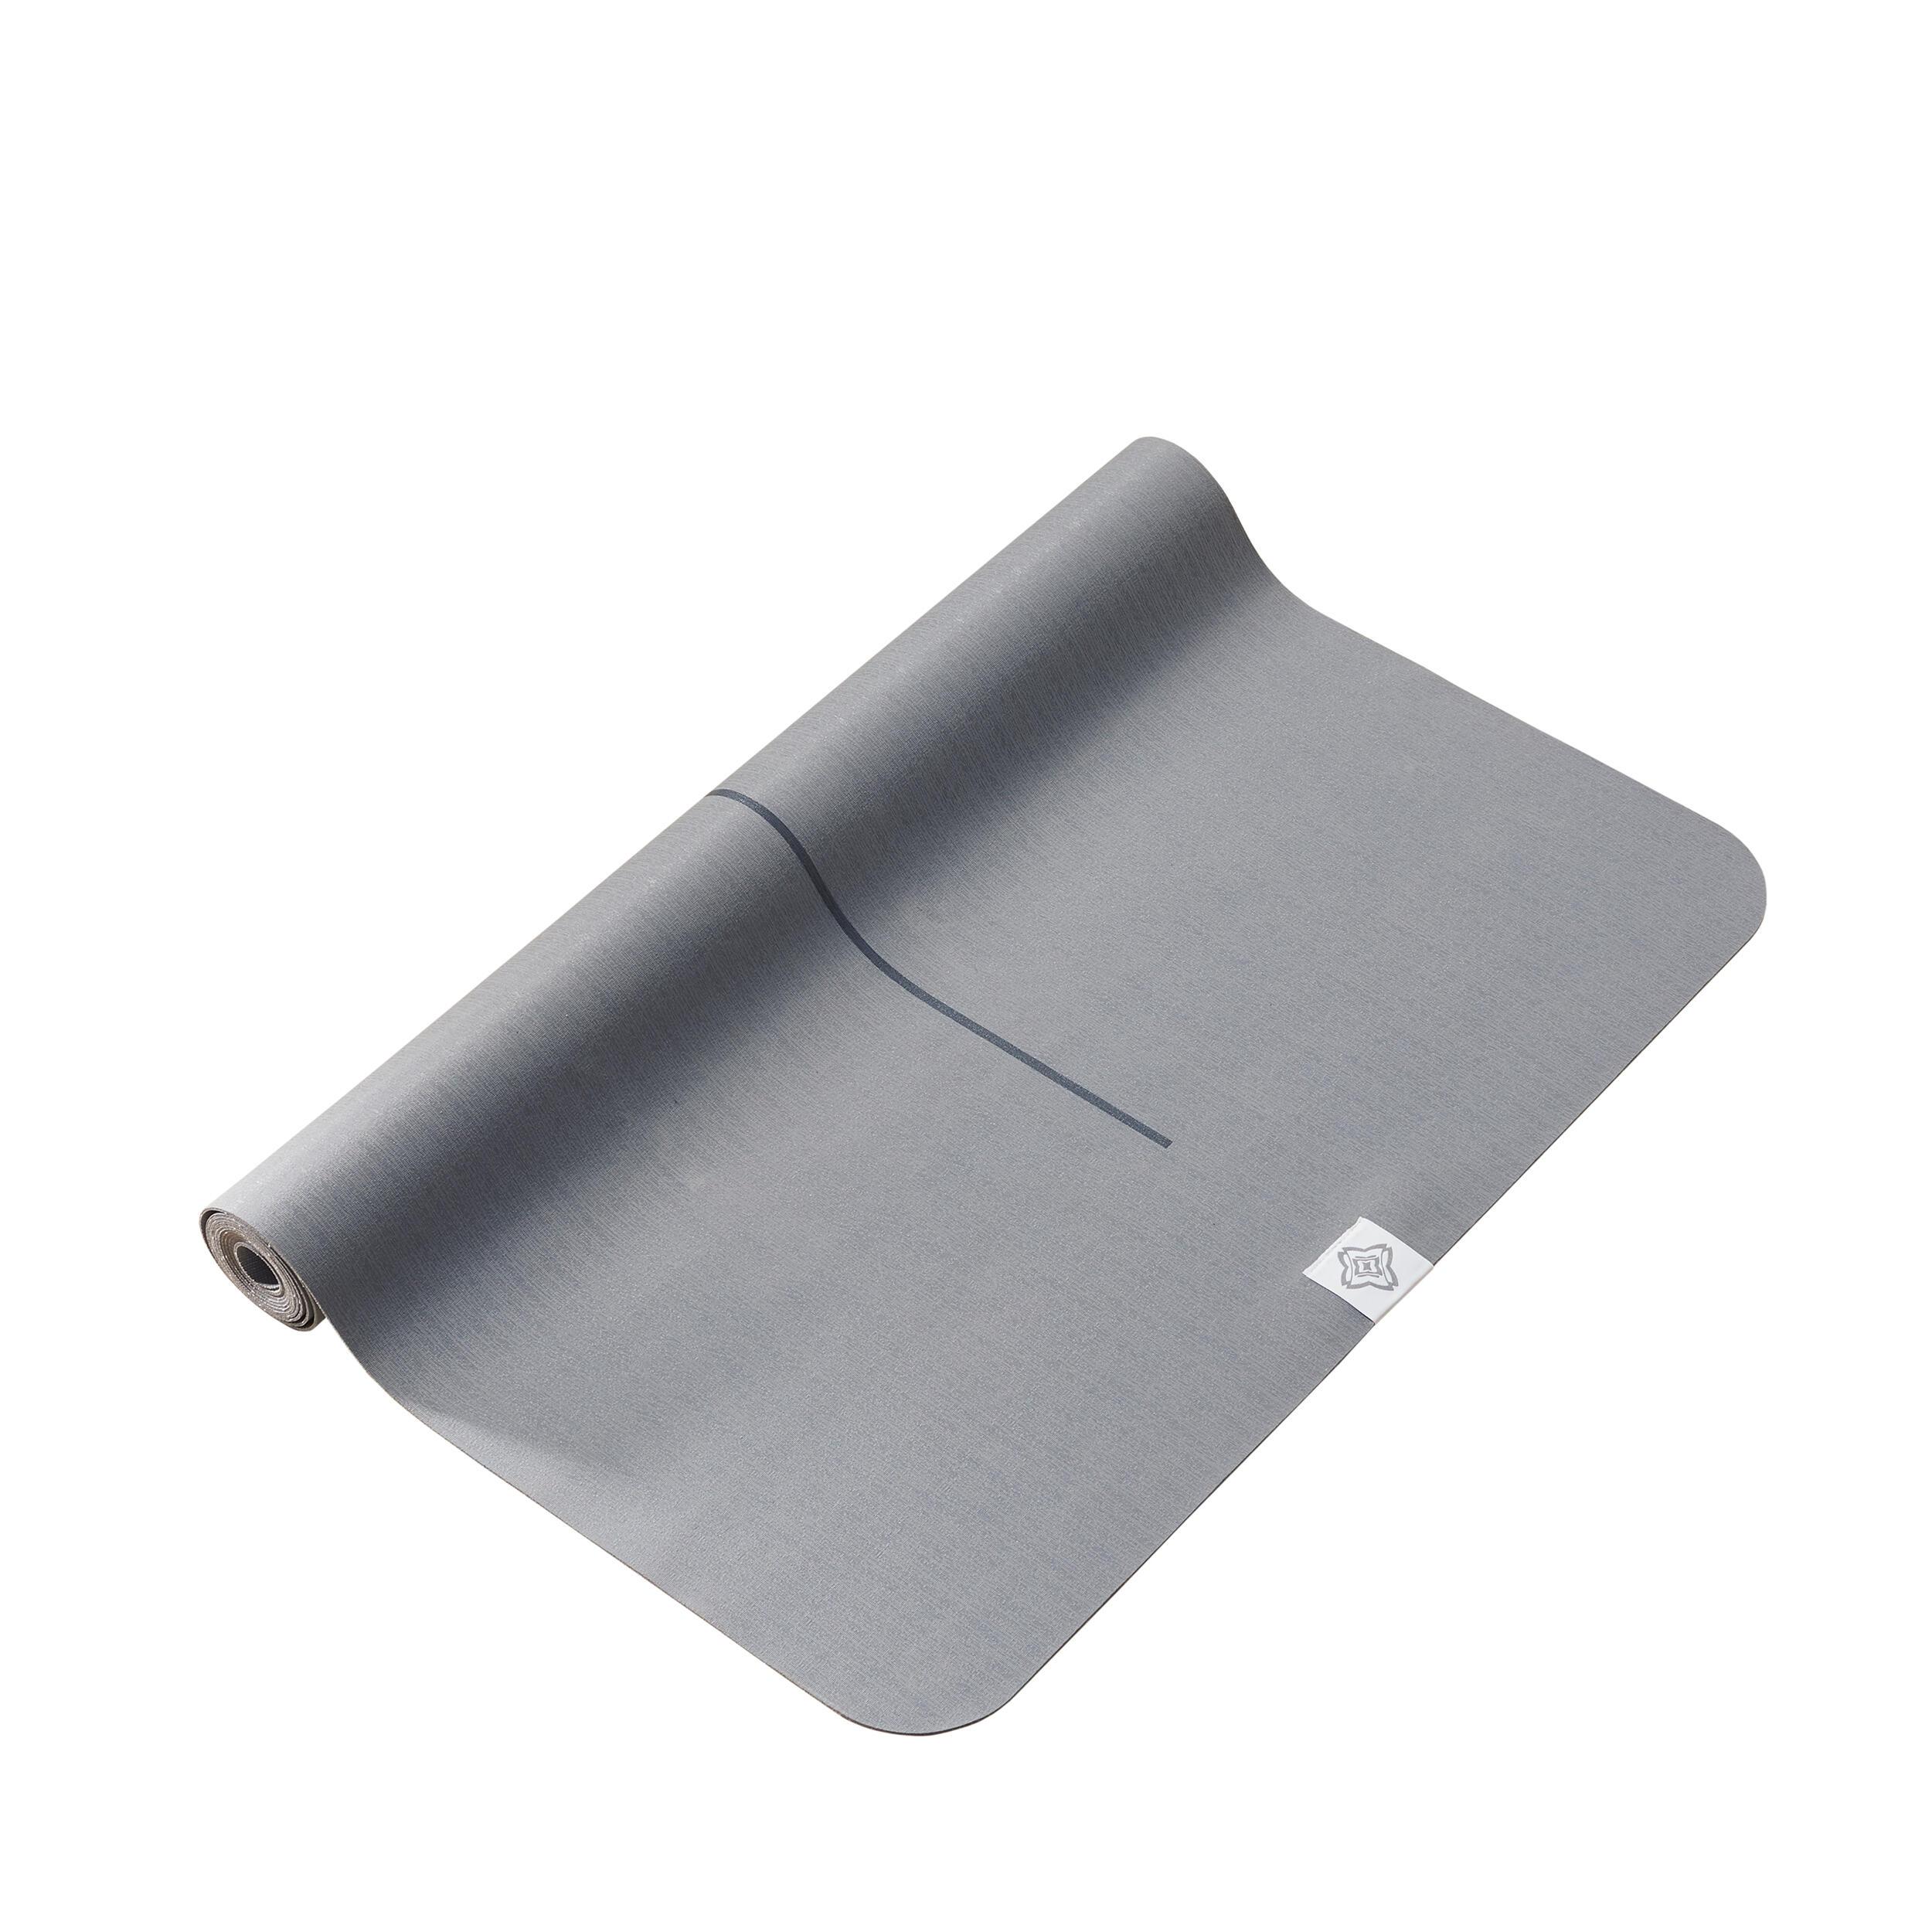 Saltea/Supra-saltea Yoga 1.5mm